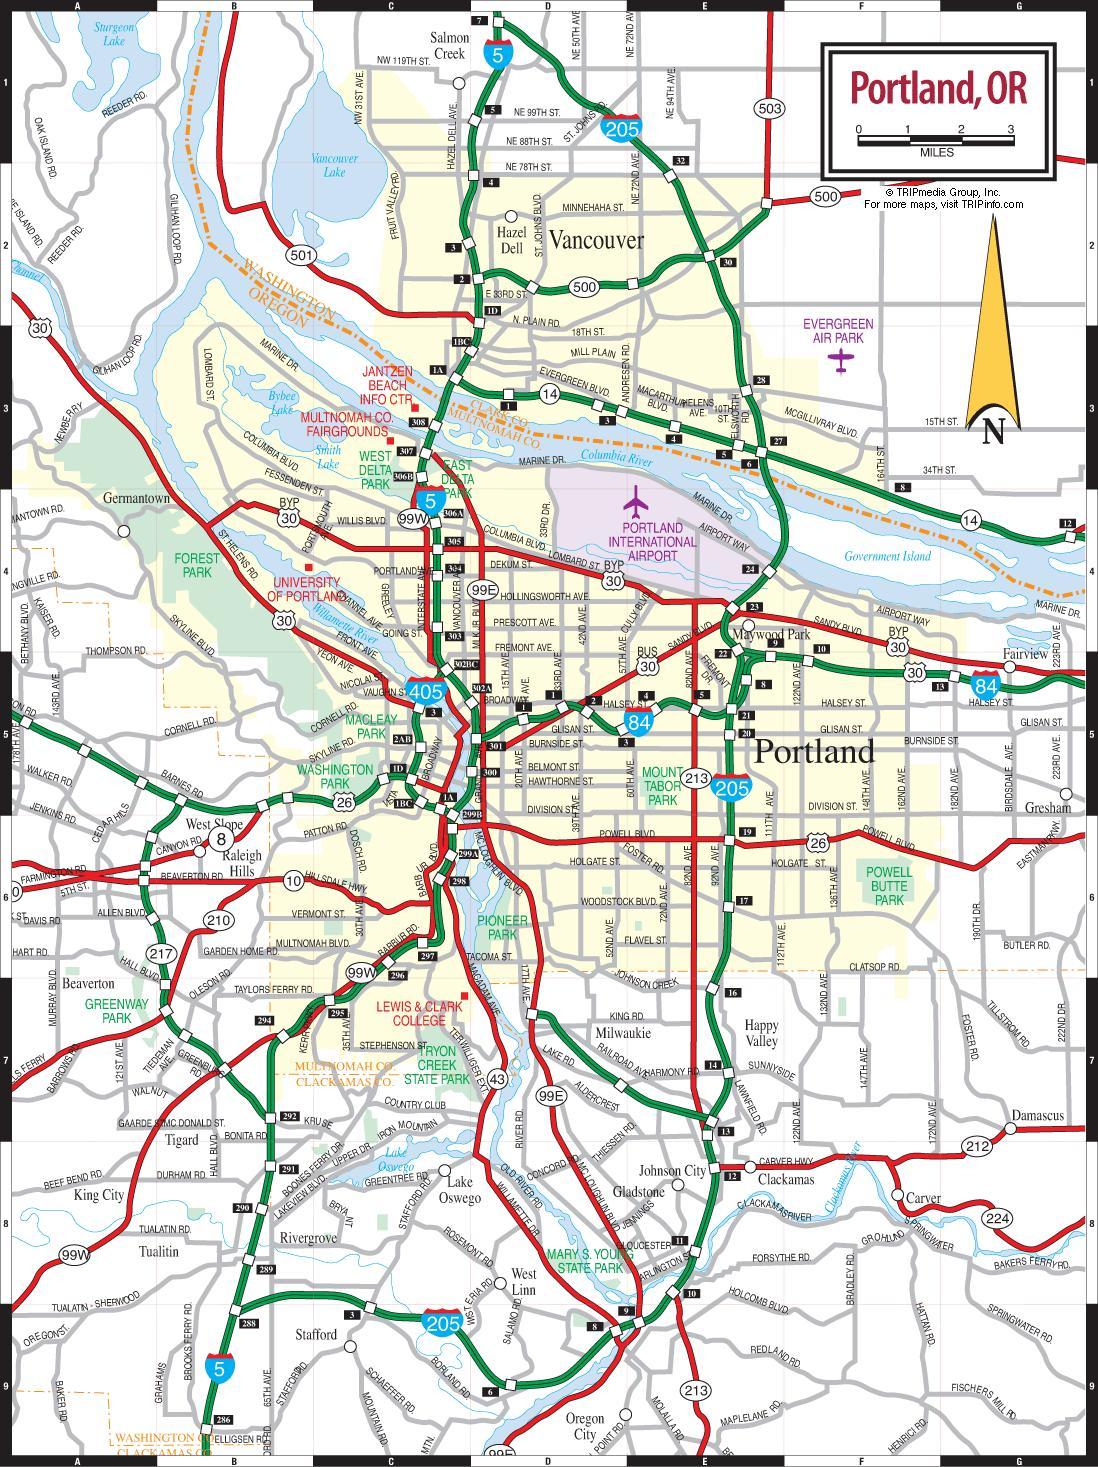 Portland Oregon road map - Portland road map (Oregon - USA)